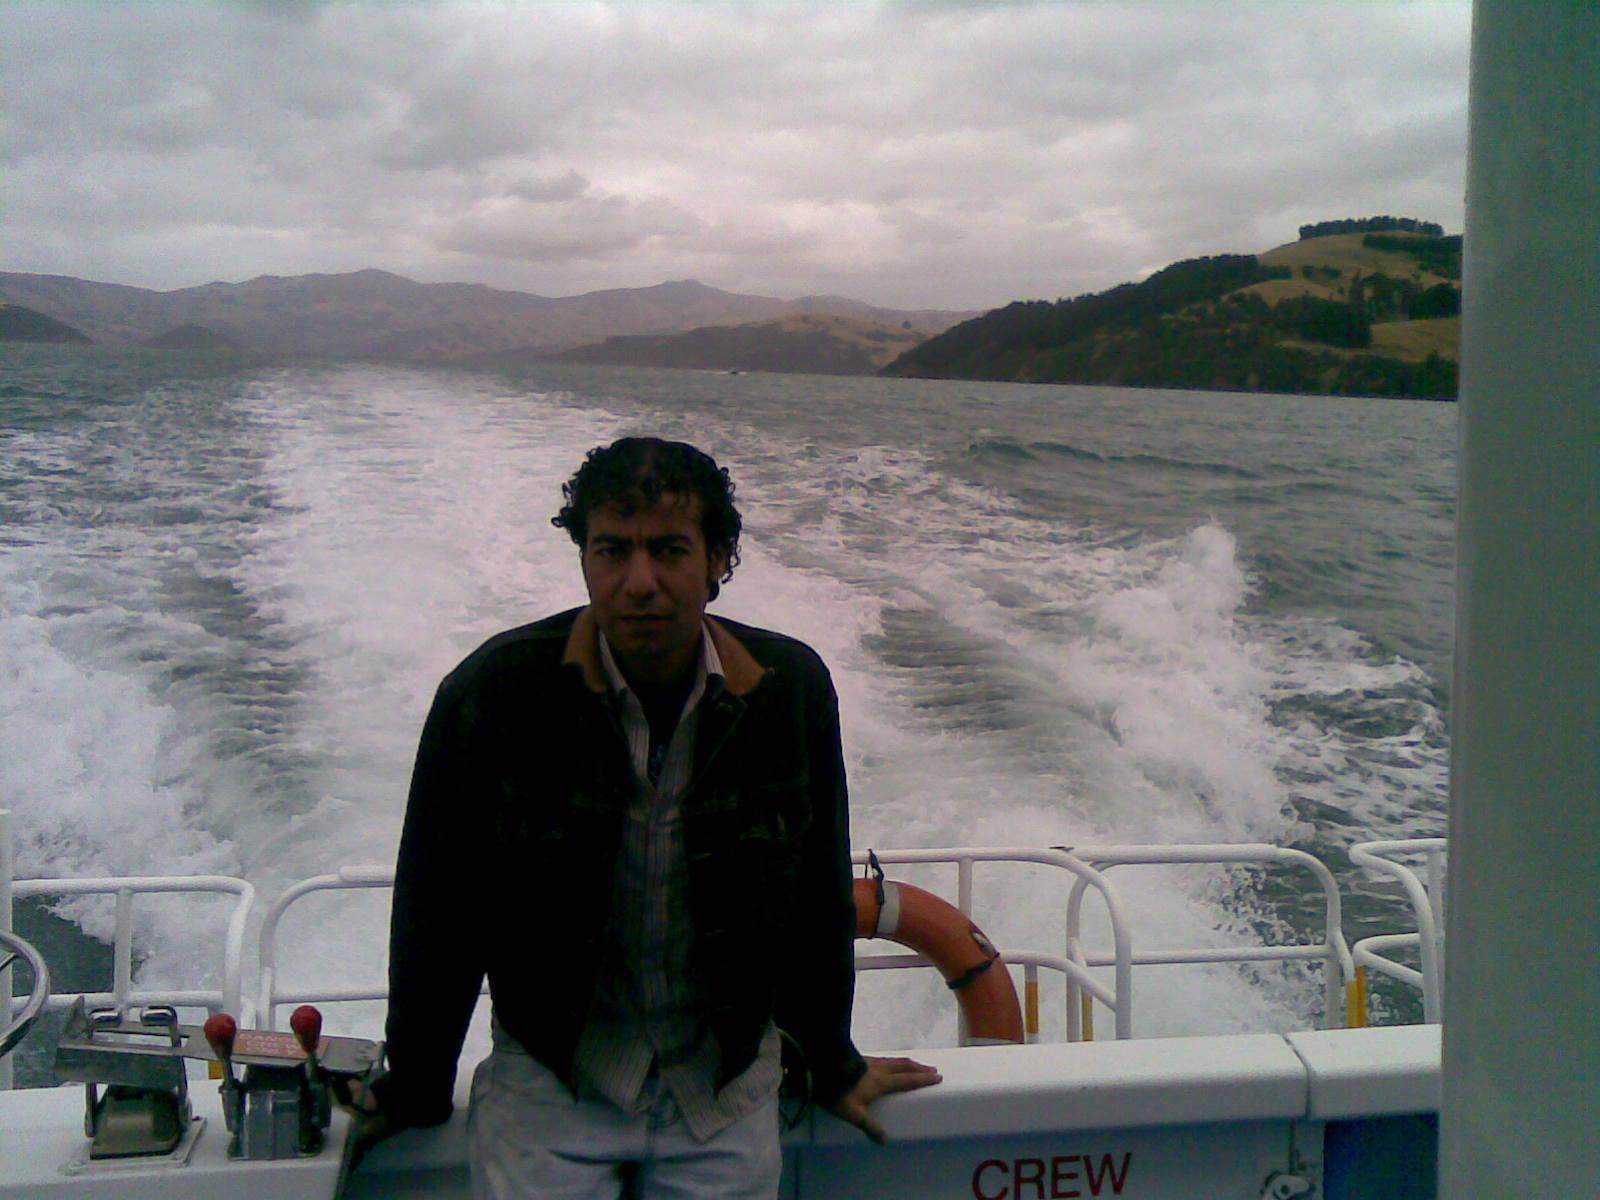 Ghassan monezel